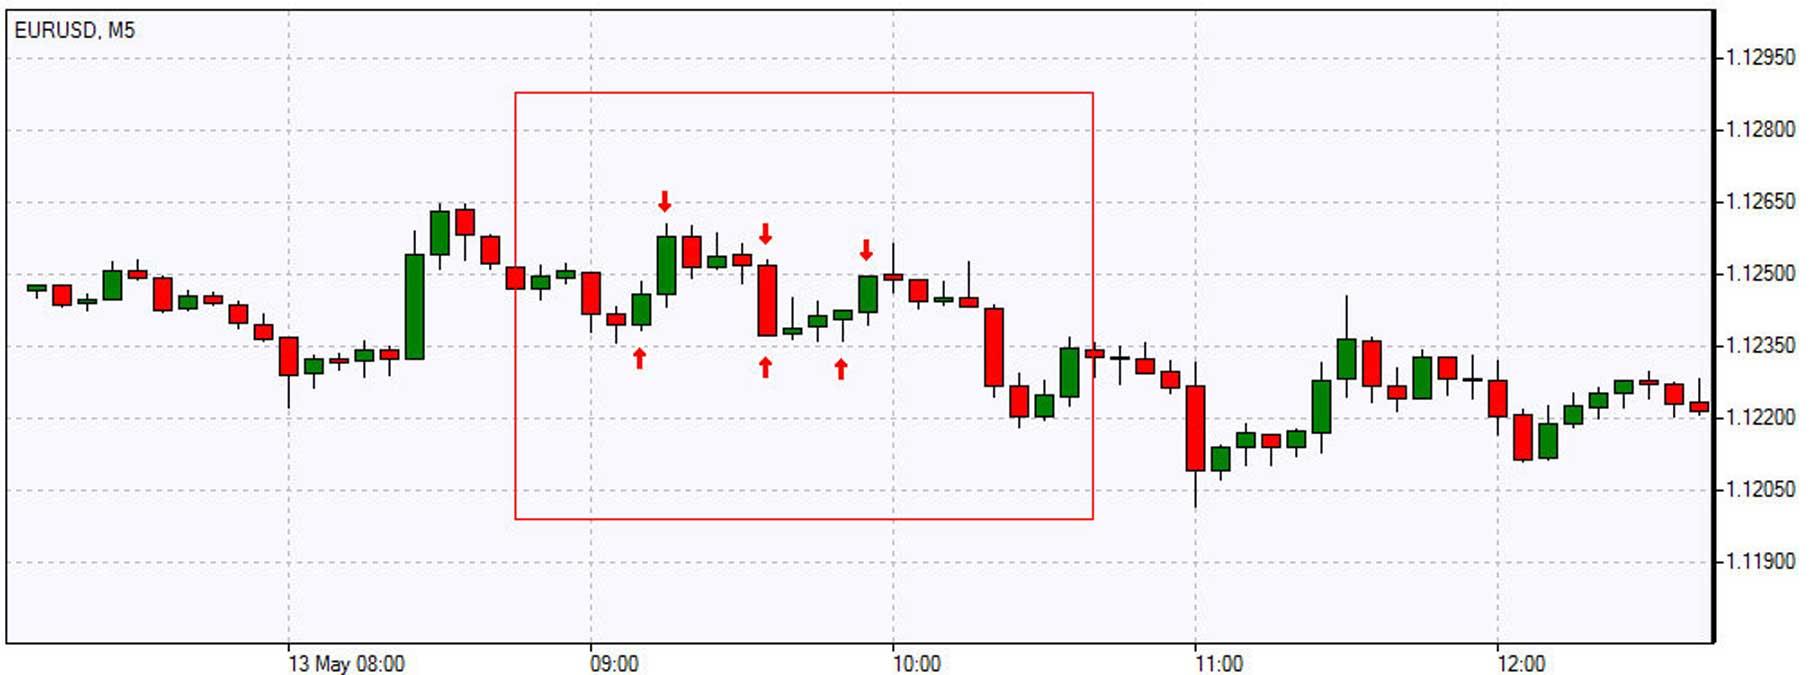 Bid ask trading strategies